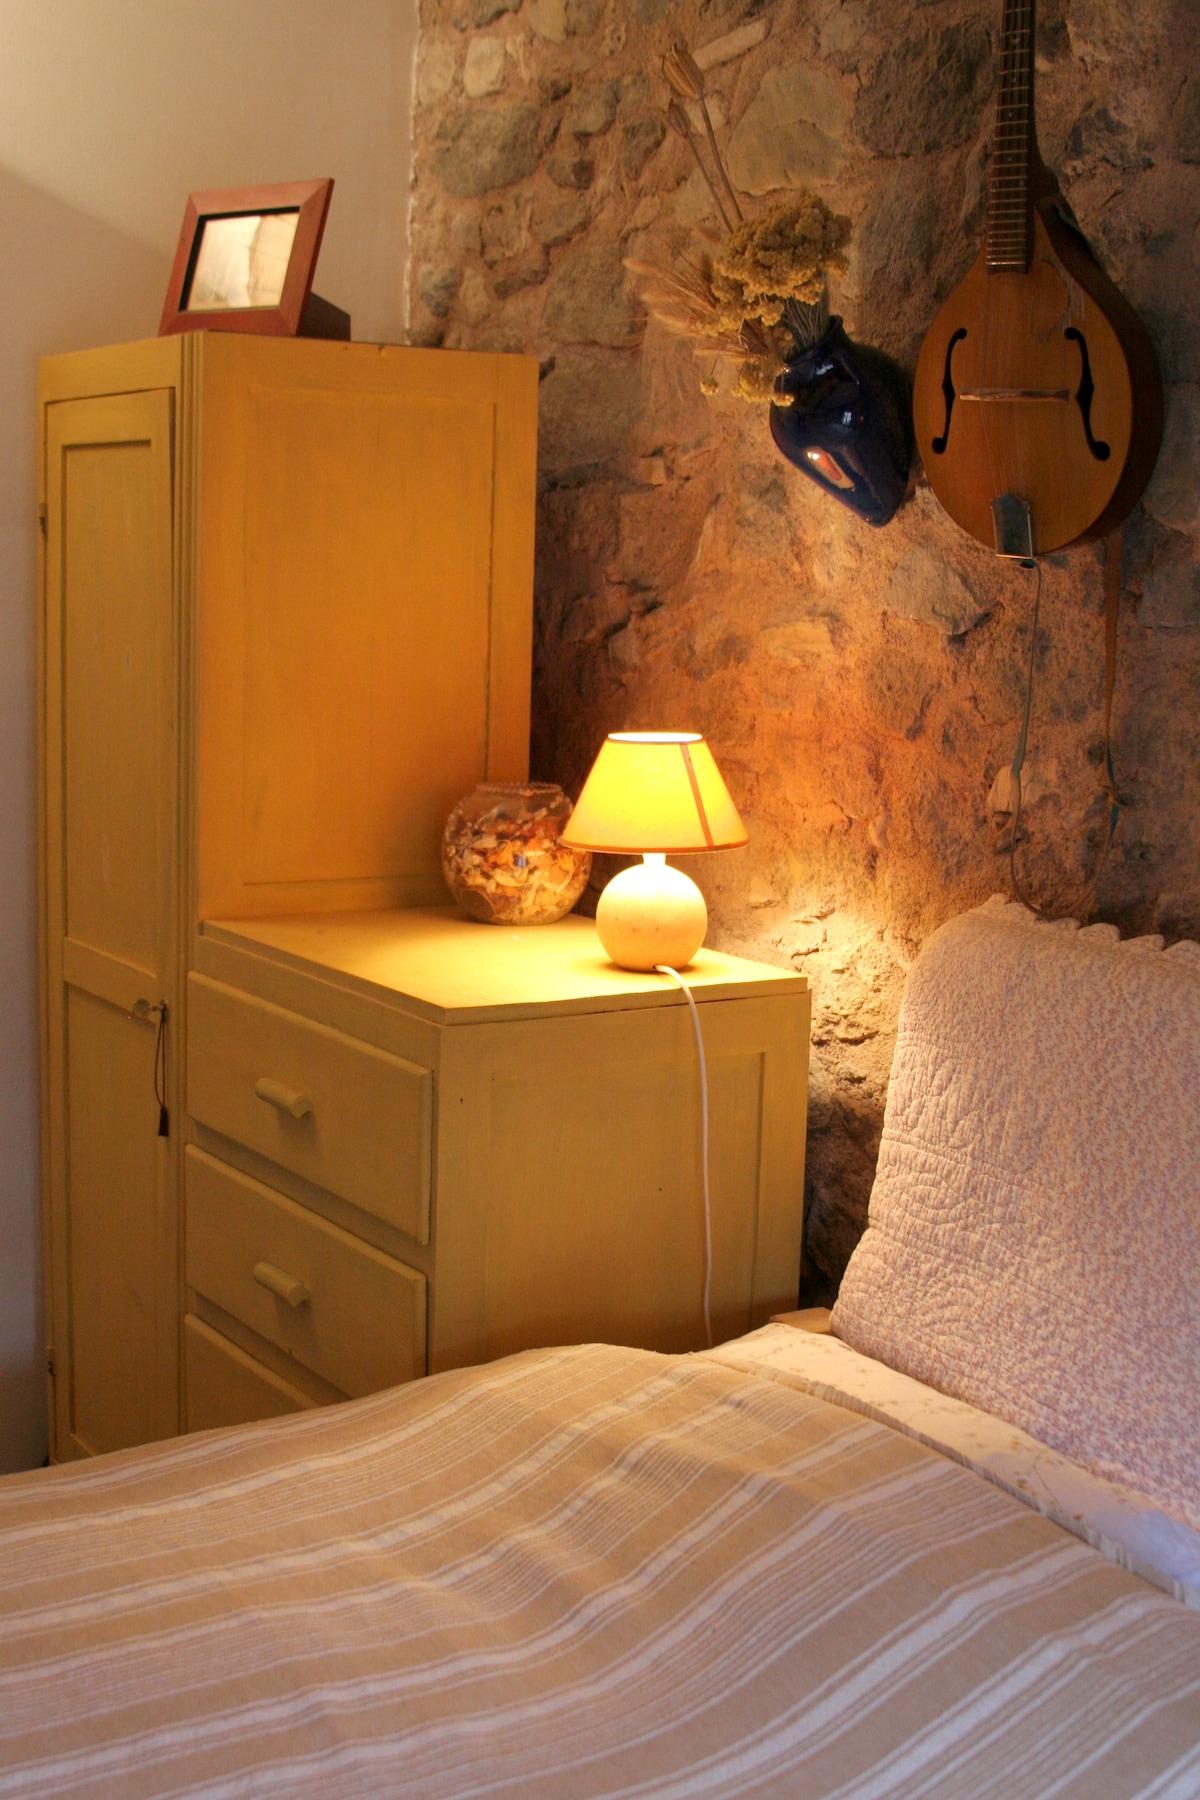 Bedroom 1 with Mandolin